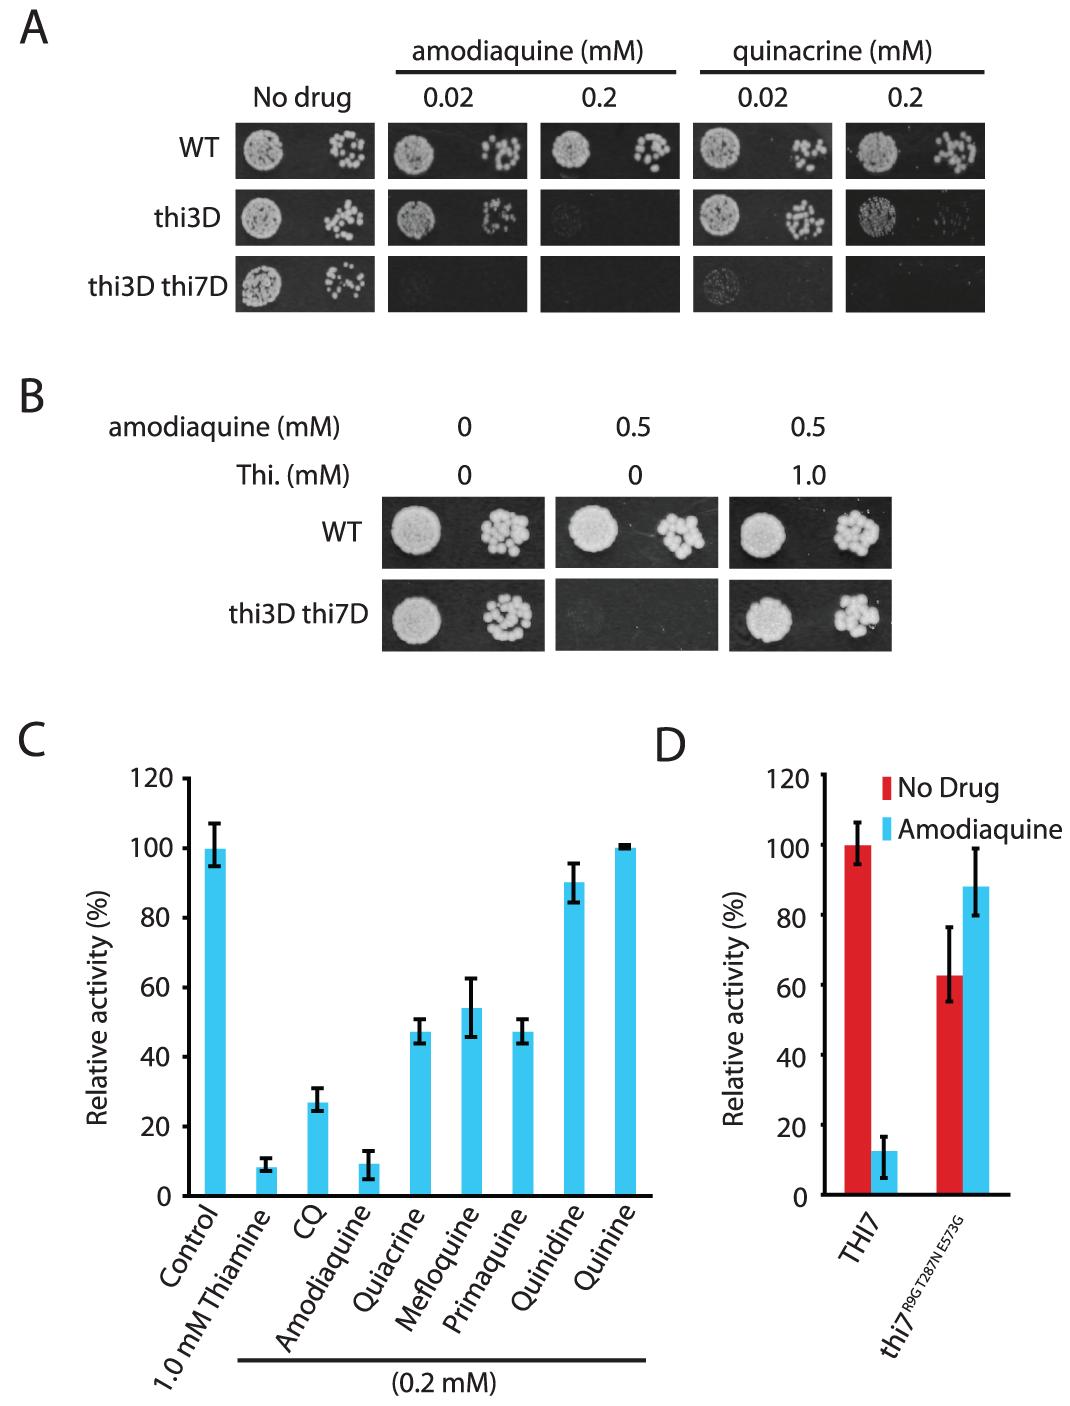 Other antimalarials inhibit thiamine transporters.